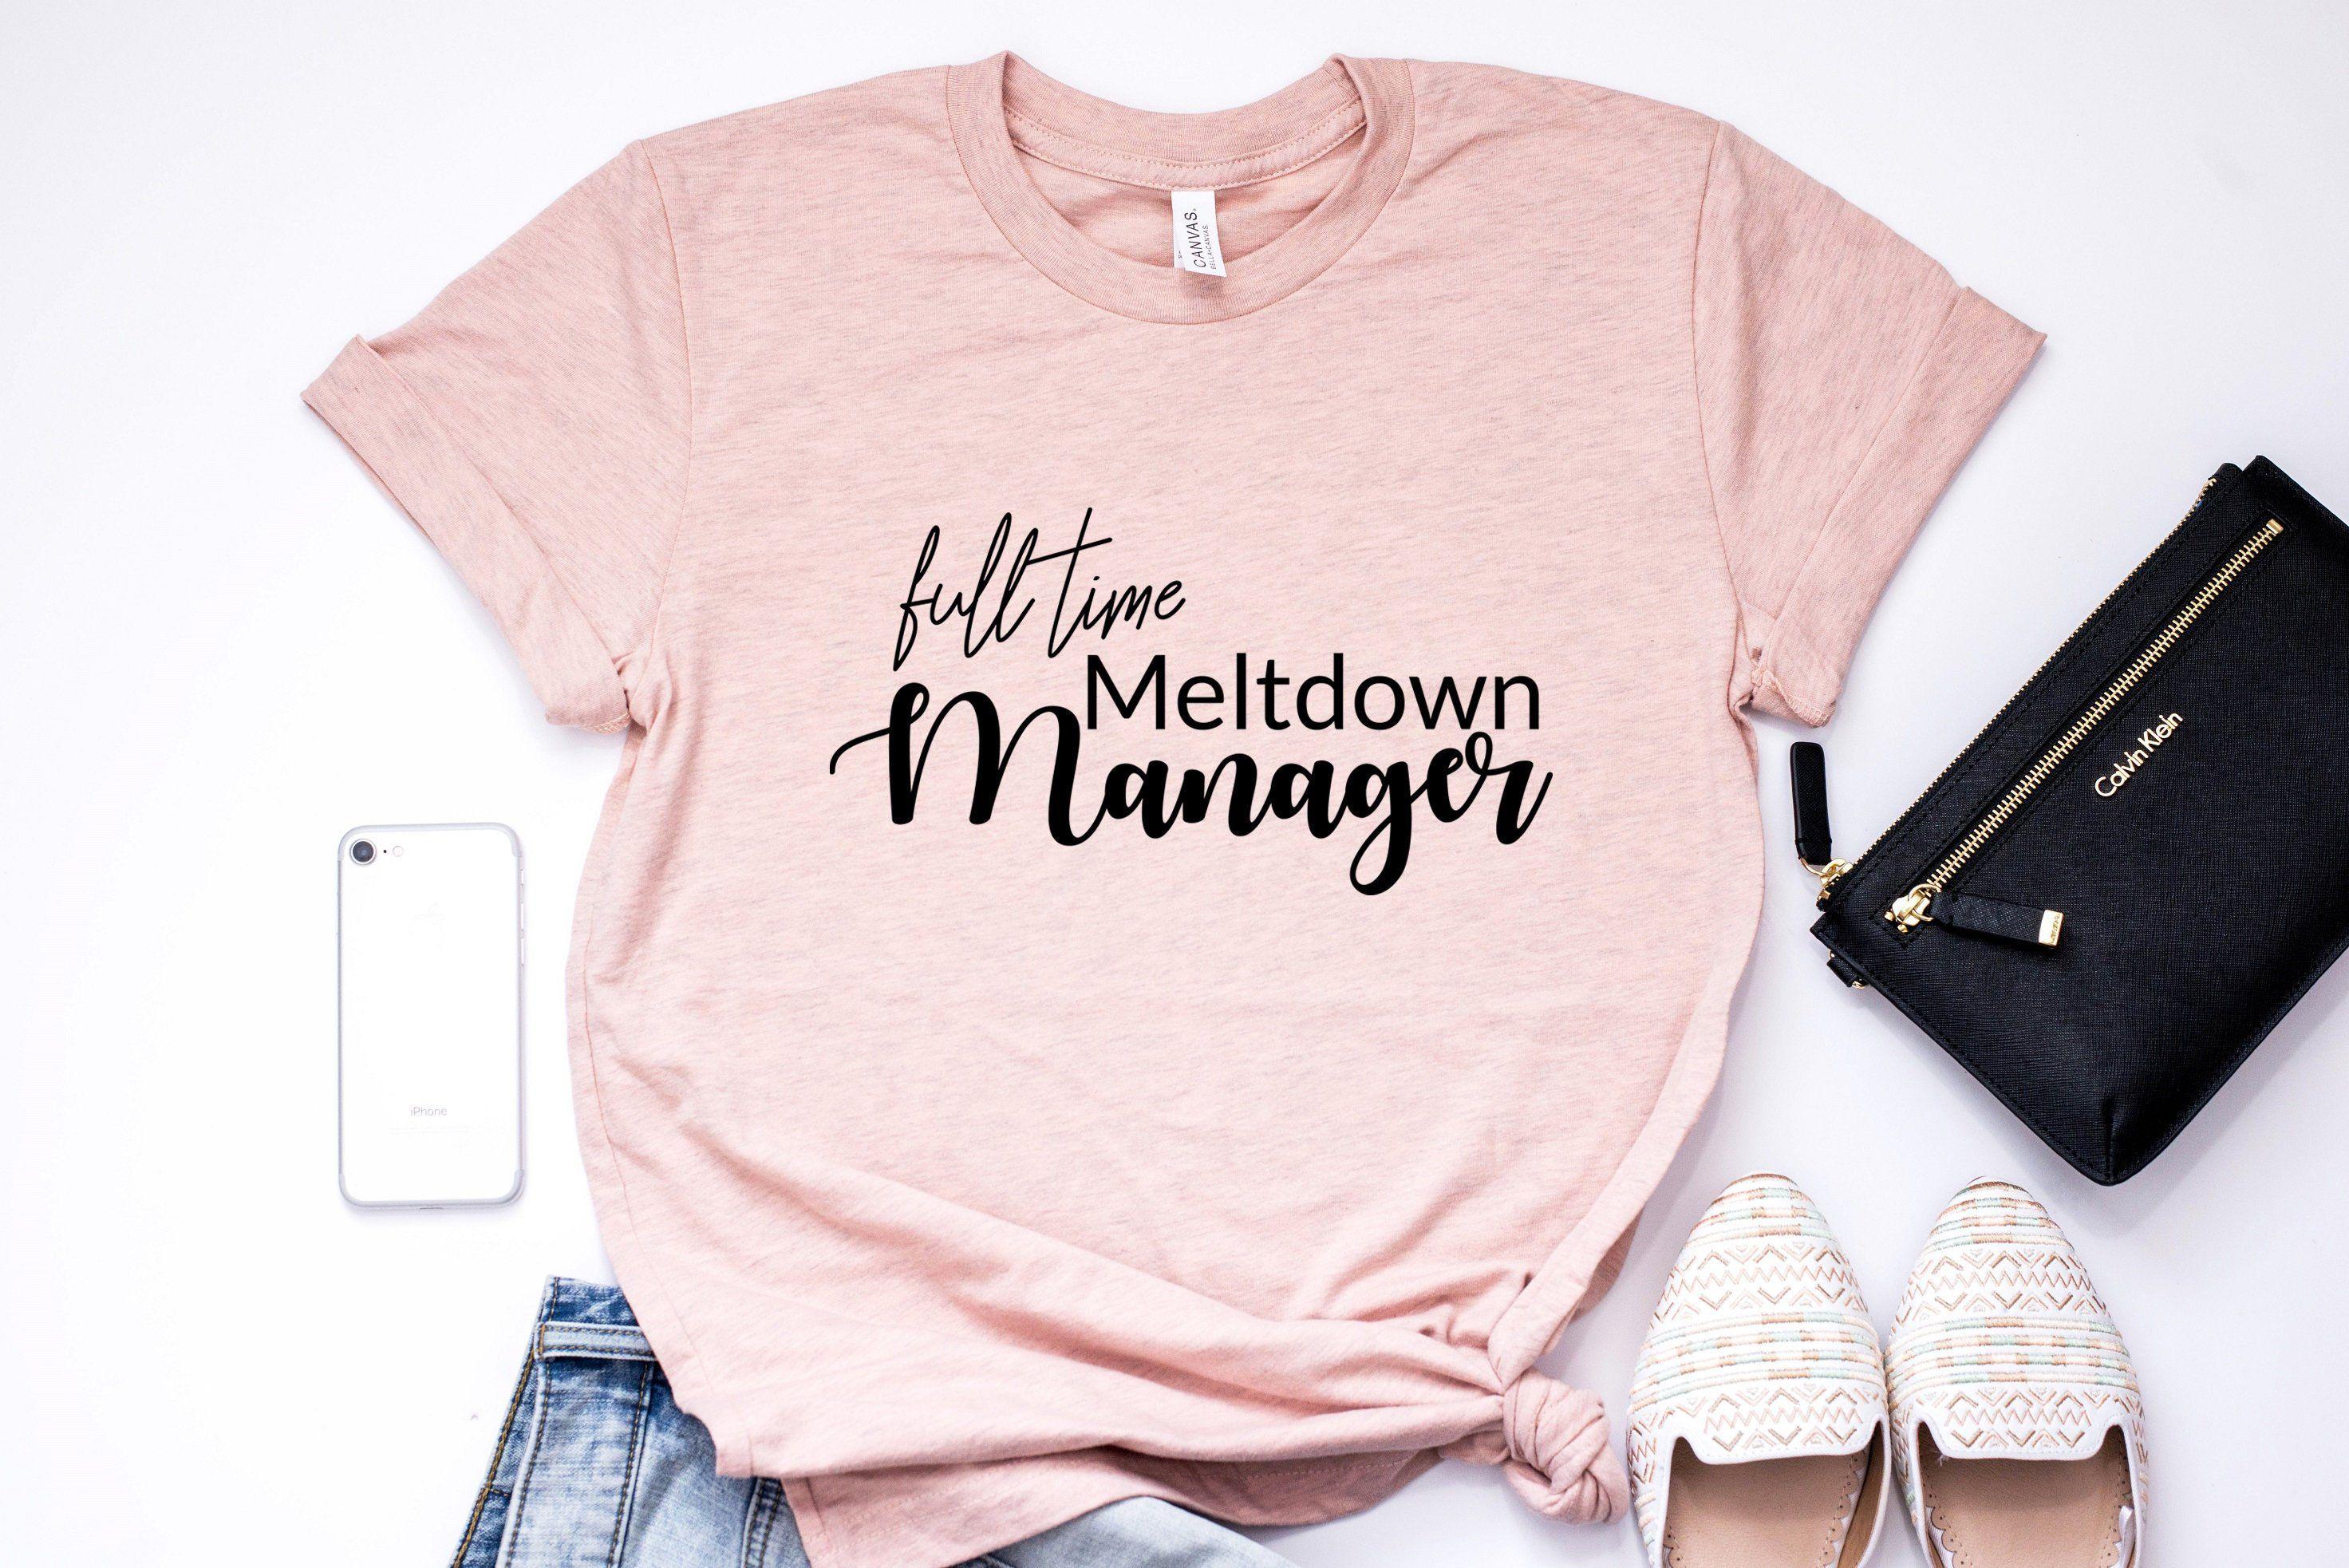 Meltdown Manager Sarcastic T Shirt Funny Mom Sayings Mom Life Shirt Mothers Day Gift Momlife Funnymomsh Mom Life Shirt Funny Mom Shirts Sarcastic Tshirts